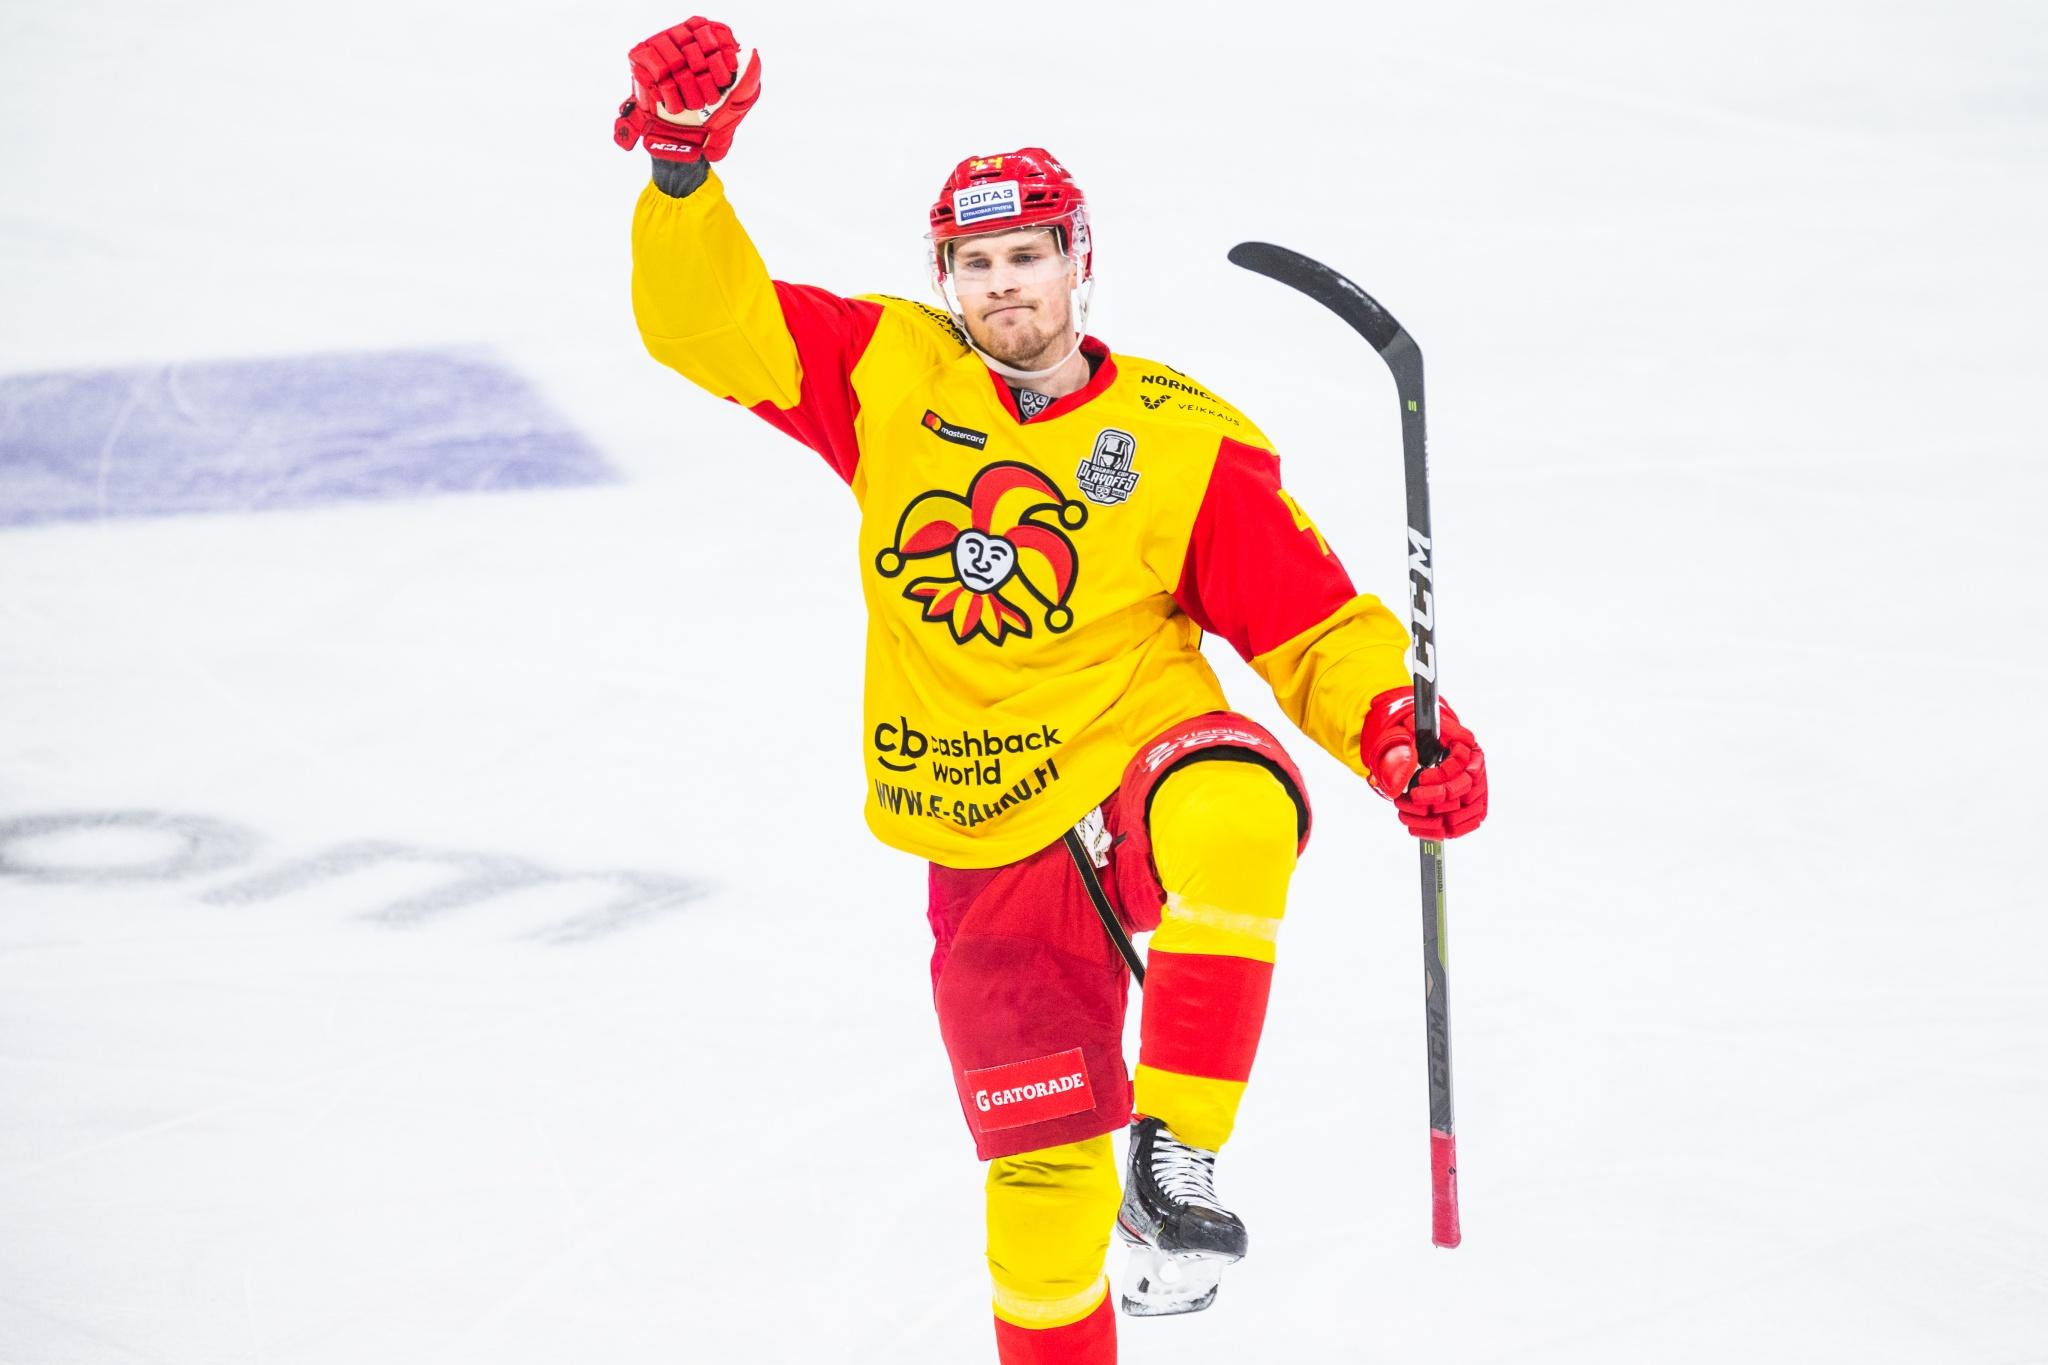 Микко Лехтонен. Фото: Эмиль Ханссон